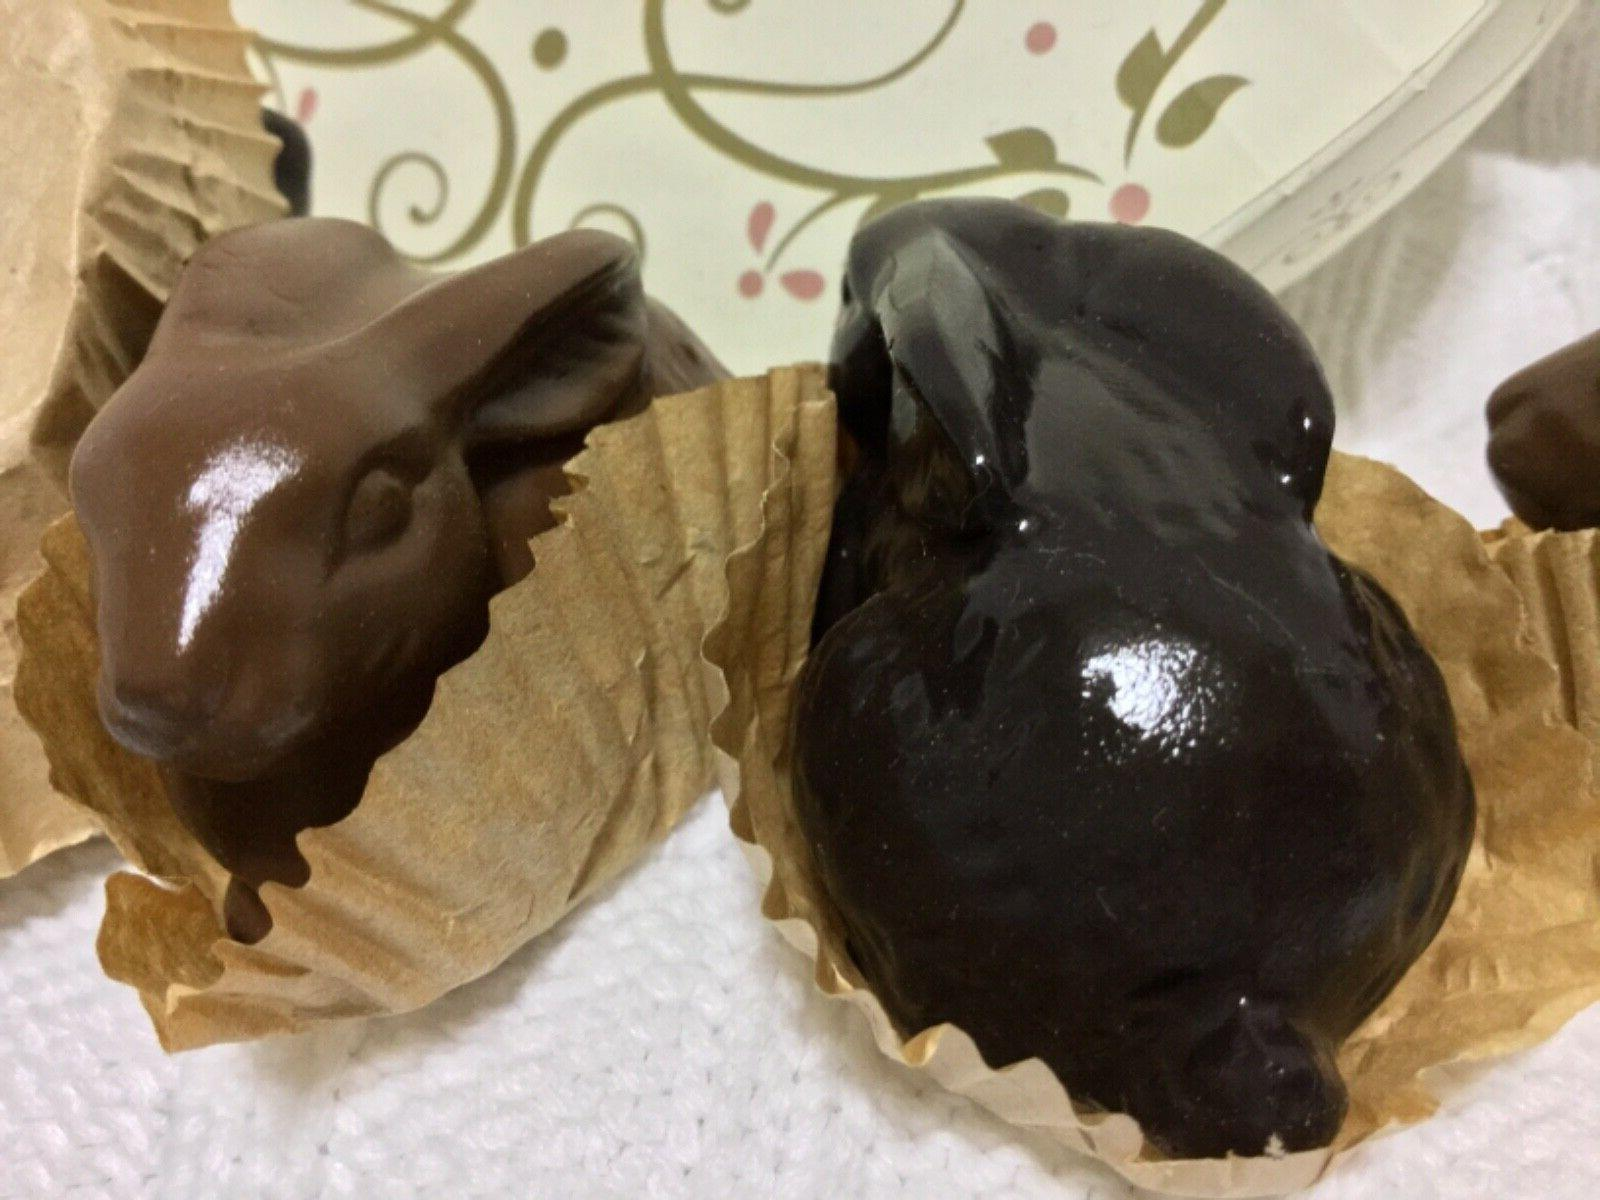 6 DARK/MILK CHOCOLATE BOXED BUNNY DECORATIONS